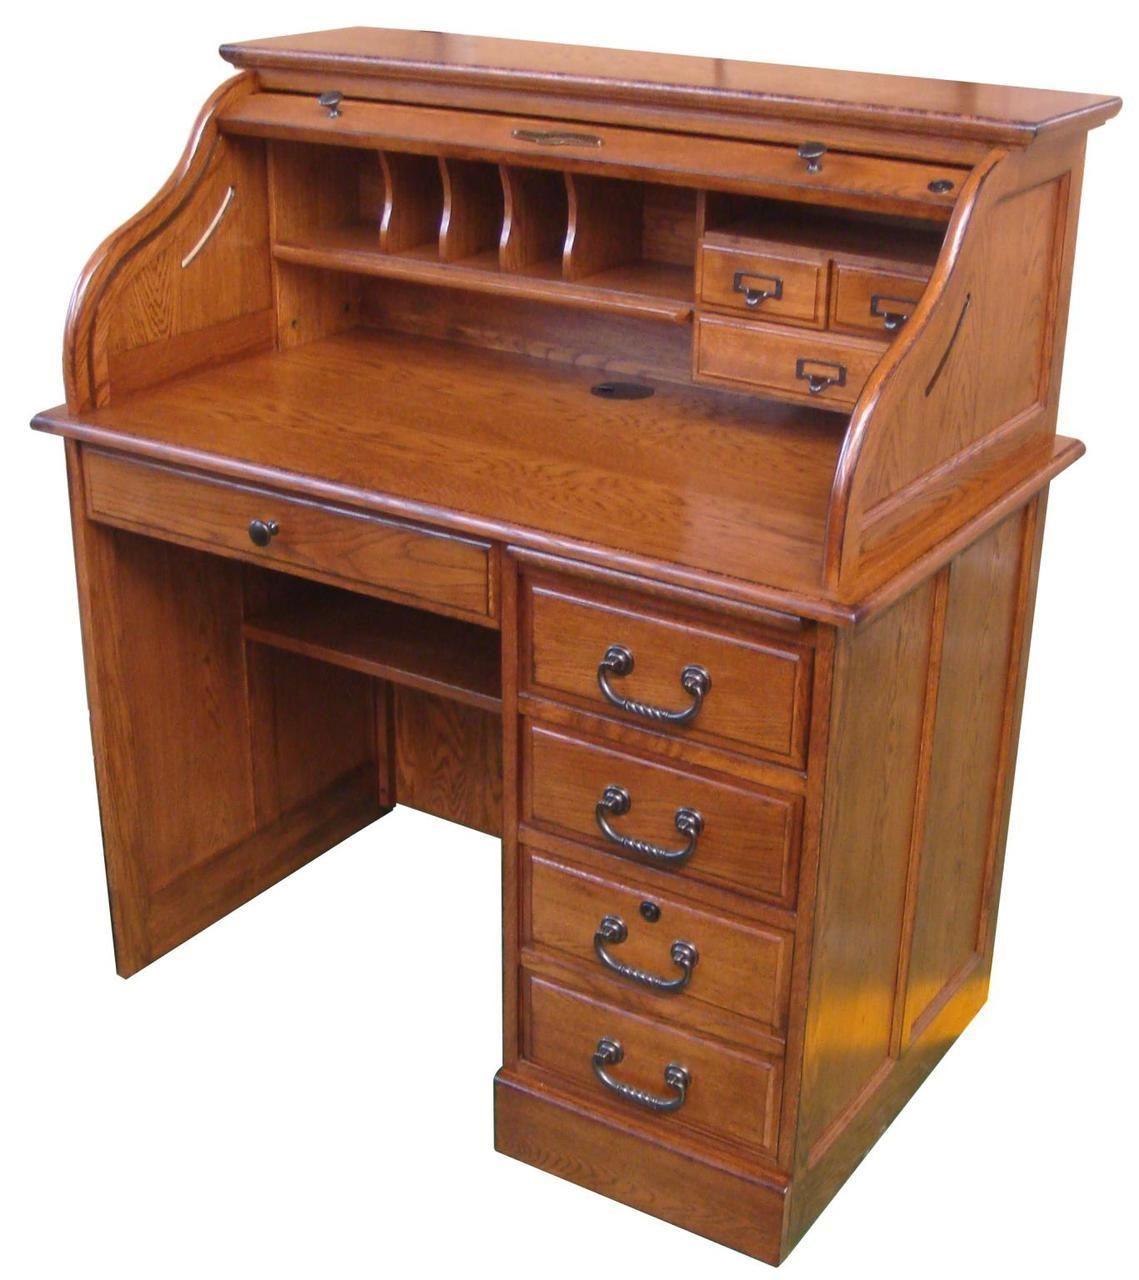 Solid Oak Wood Small Student Roll Top Desk Single Pedestal